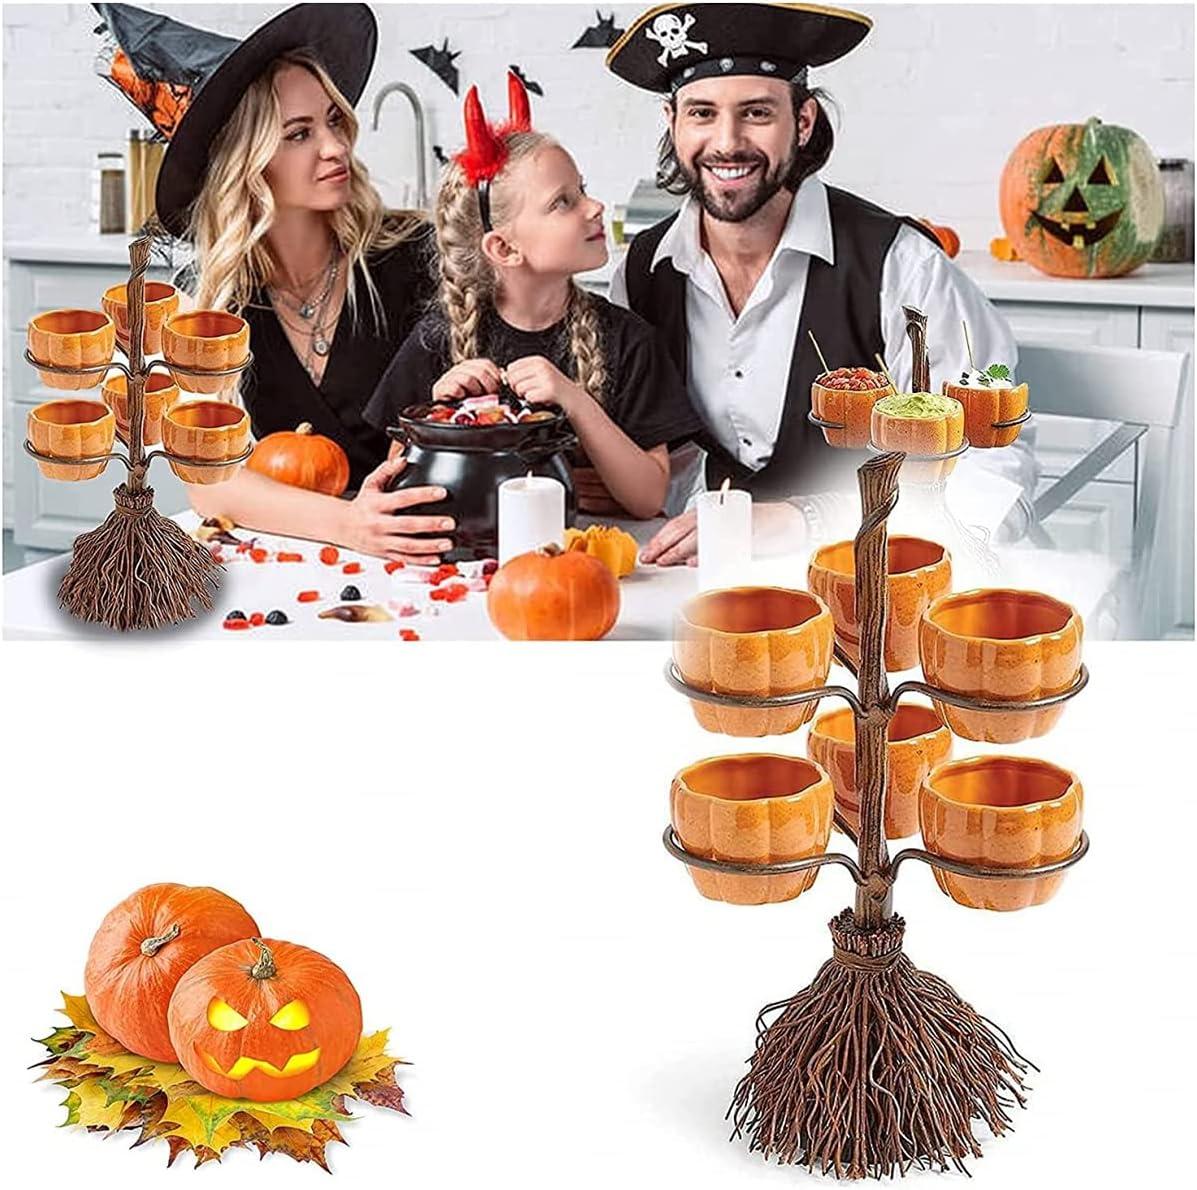 25% OFF Lifekisser Halloween Witch Financial sales sale Hat Bowl Shelf Snack Broomstick